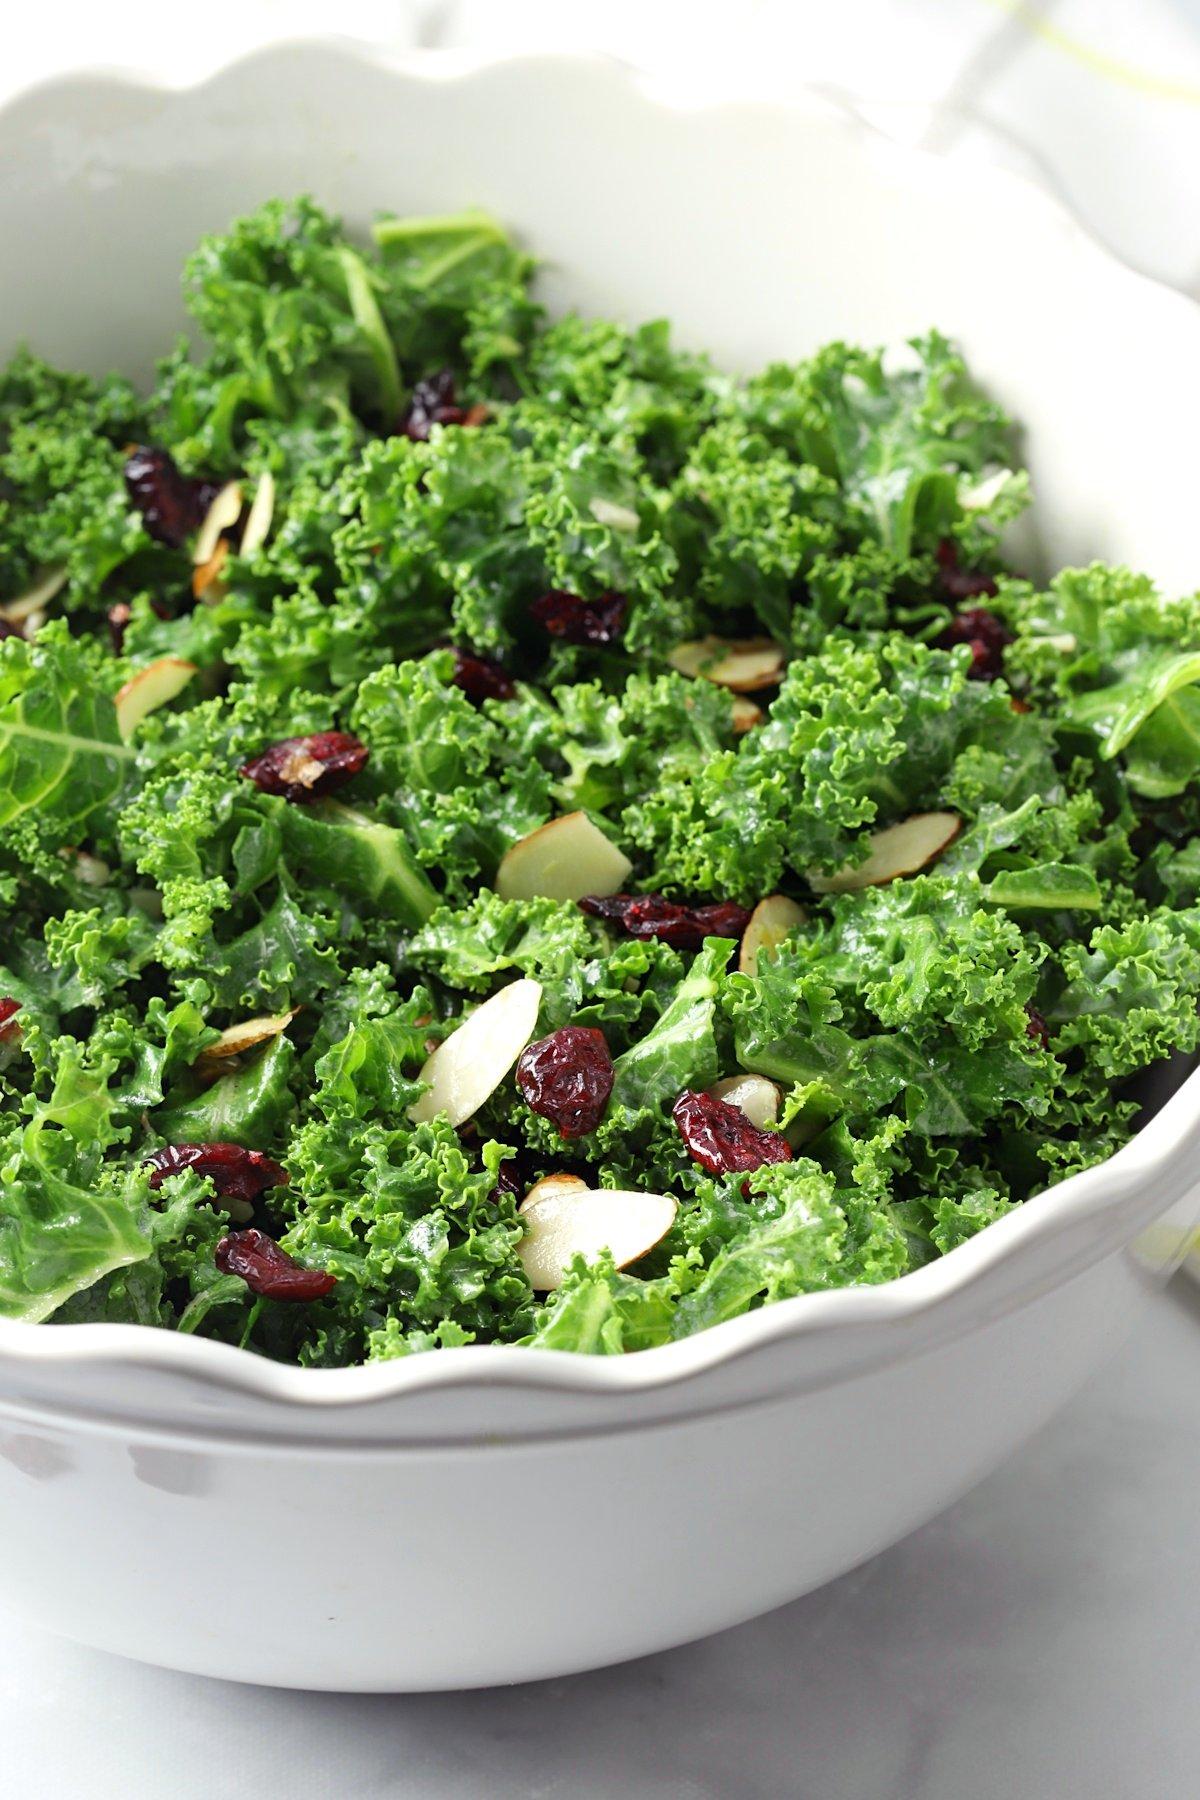 Kale salad in a white, scalloped edge bowl.